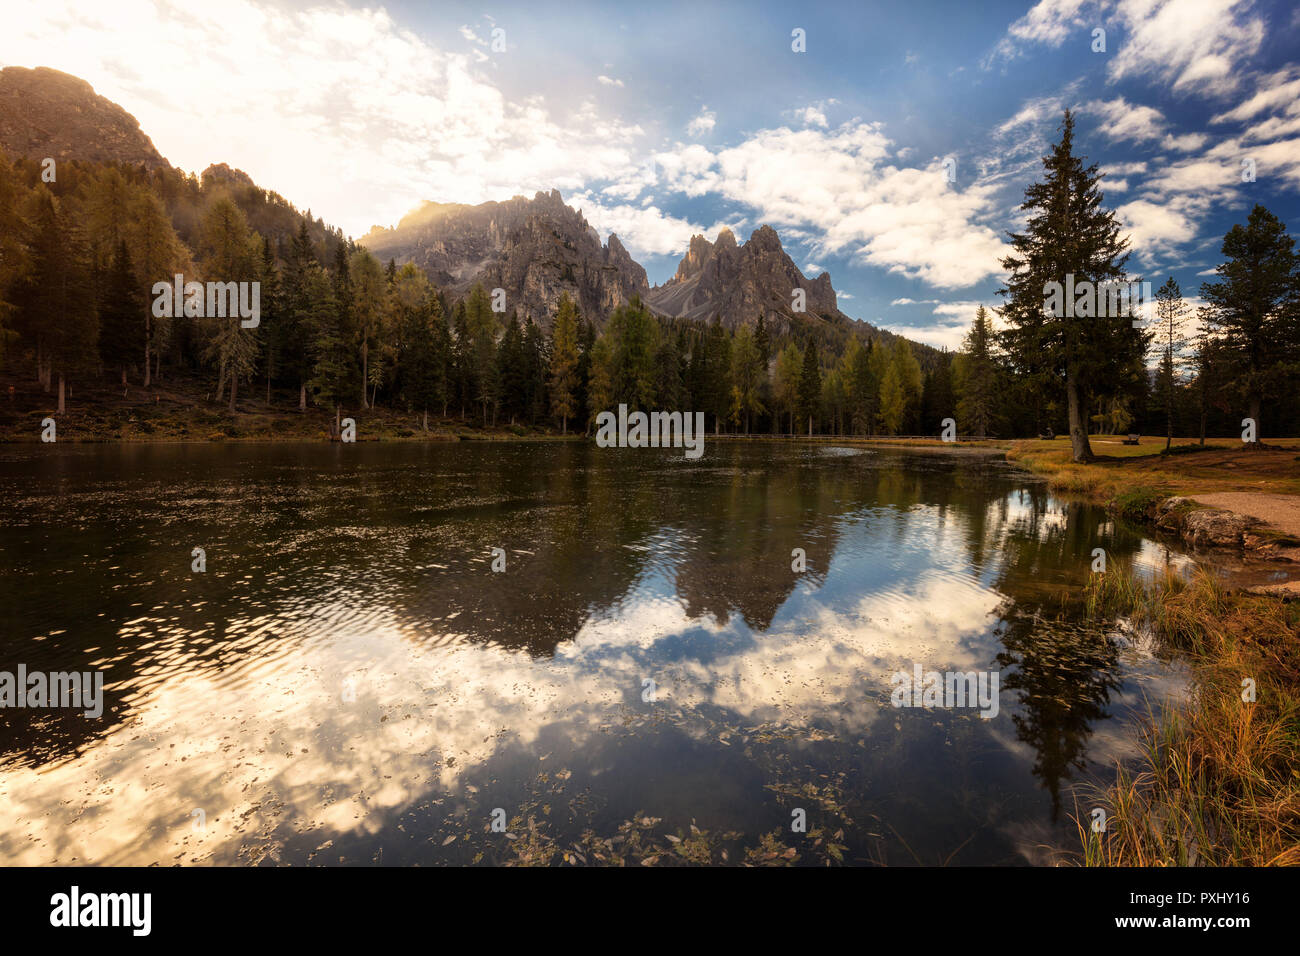 Sunrise over the mountains, Antorno lake, Italy, Europe. Stock Photo